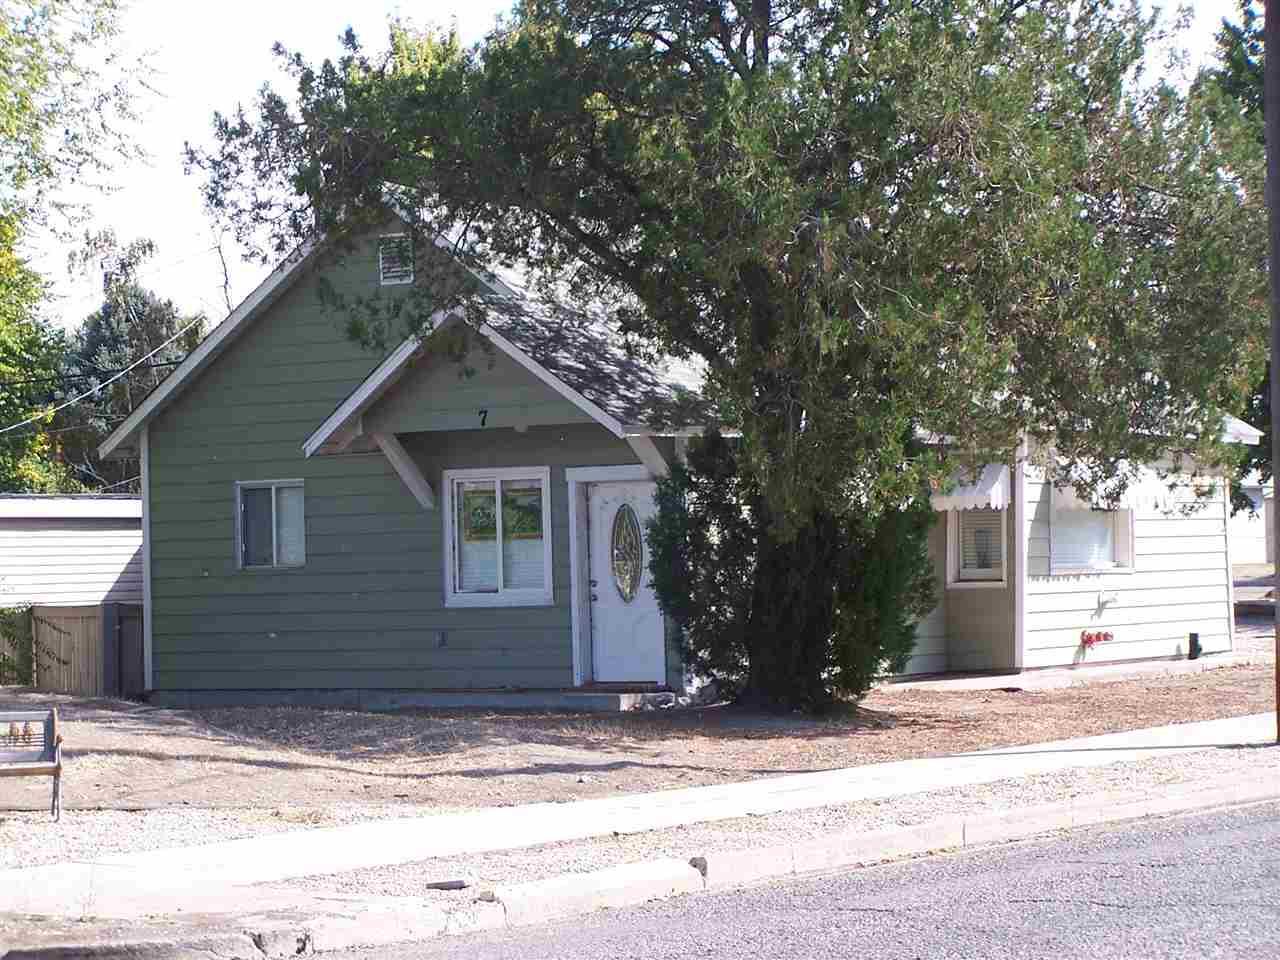 Single Family Home for Sale at 7 E CLEVELAND 7 E CLEVELAND Glenns Ferry, Idaho 83623